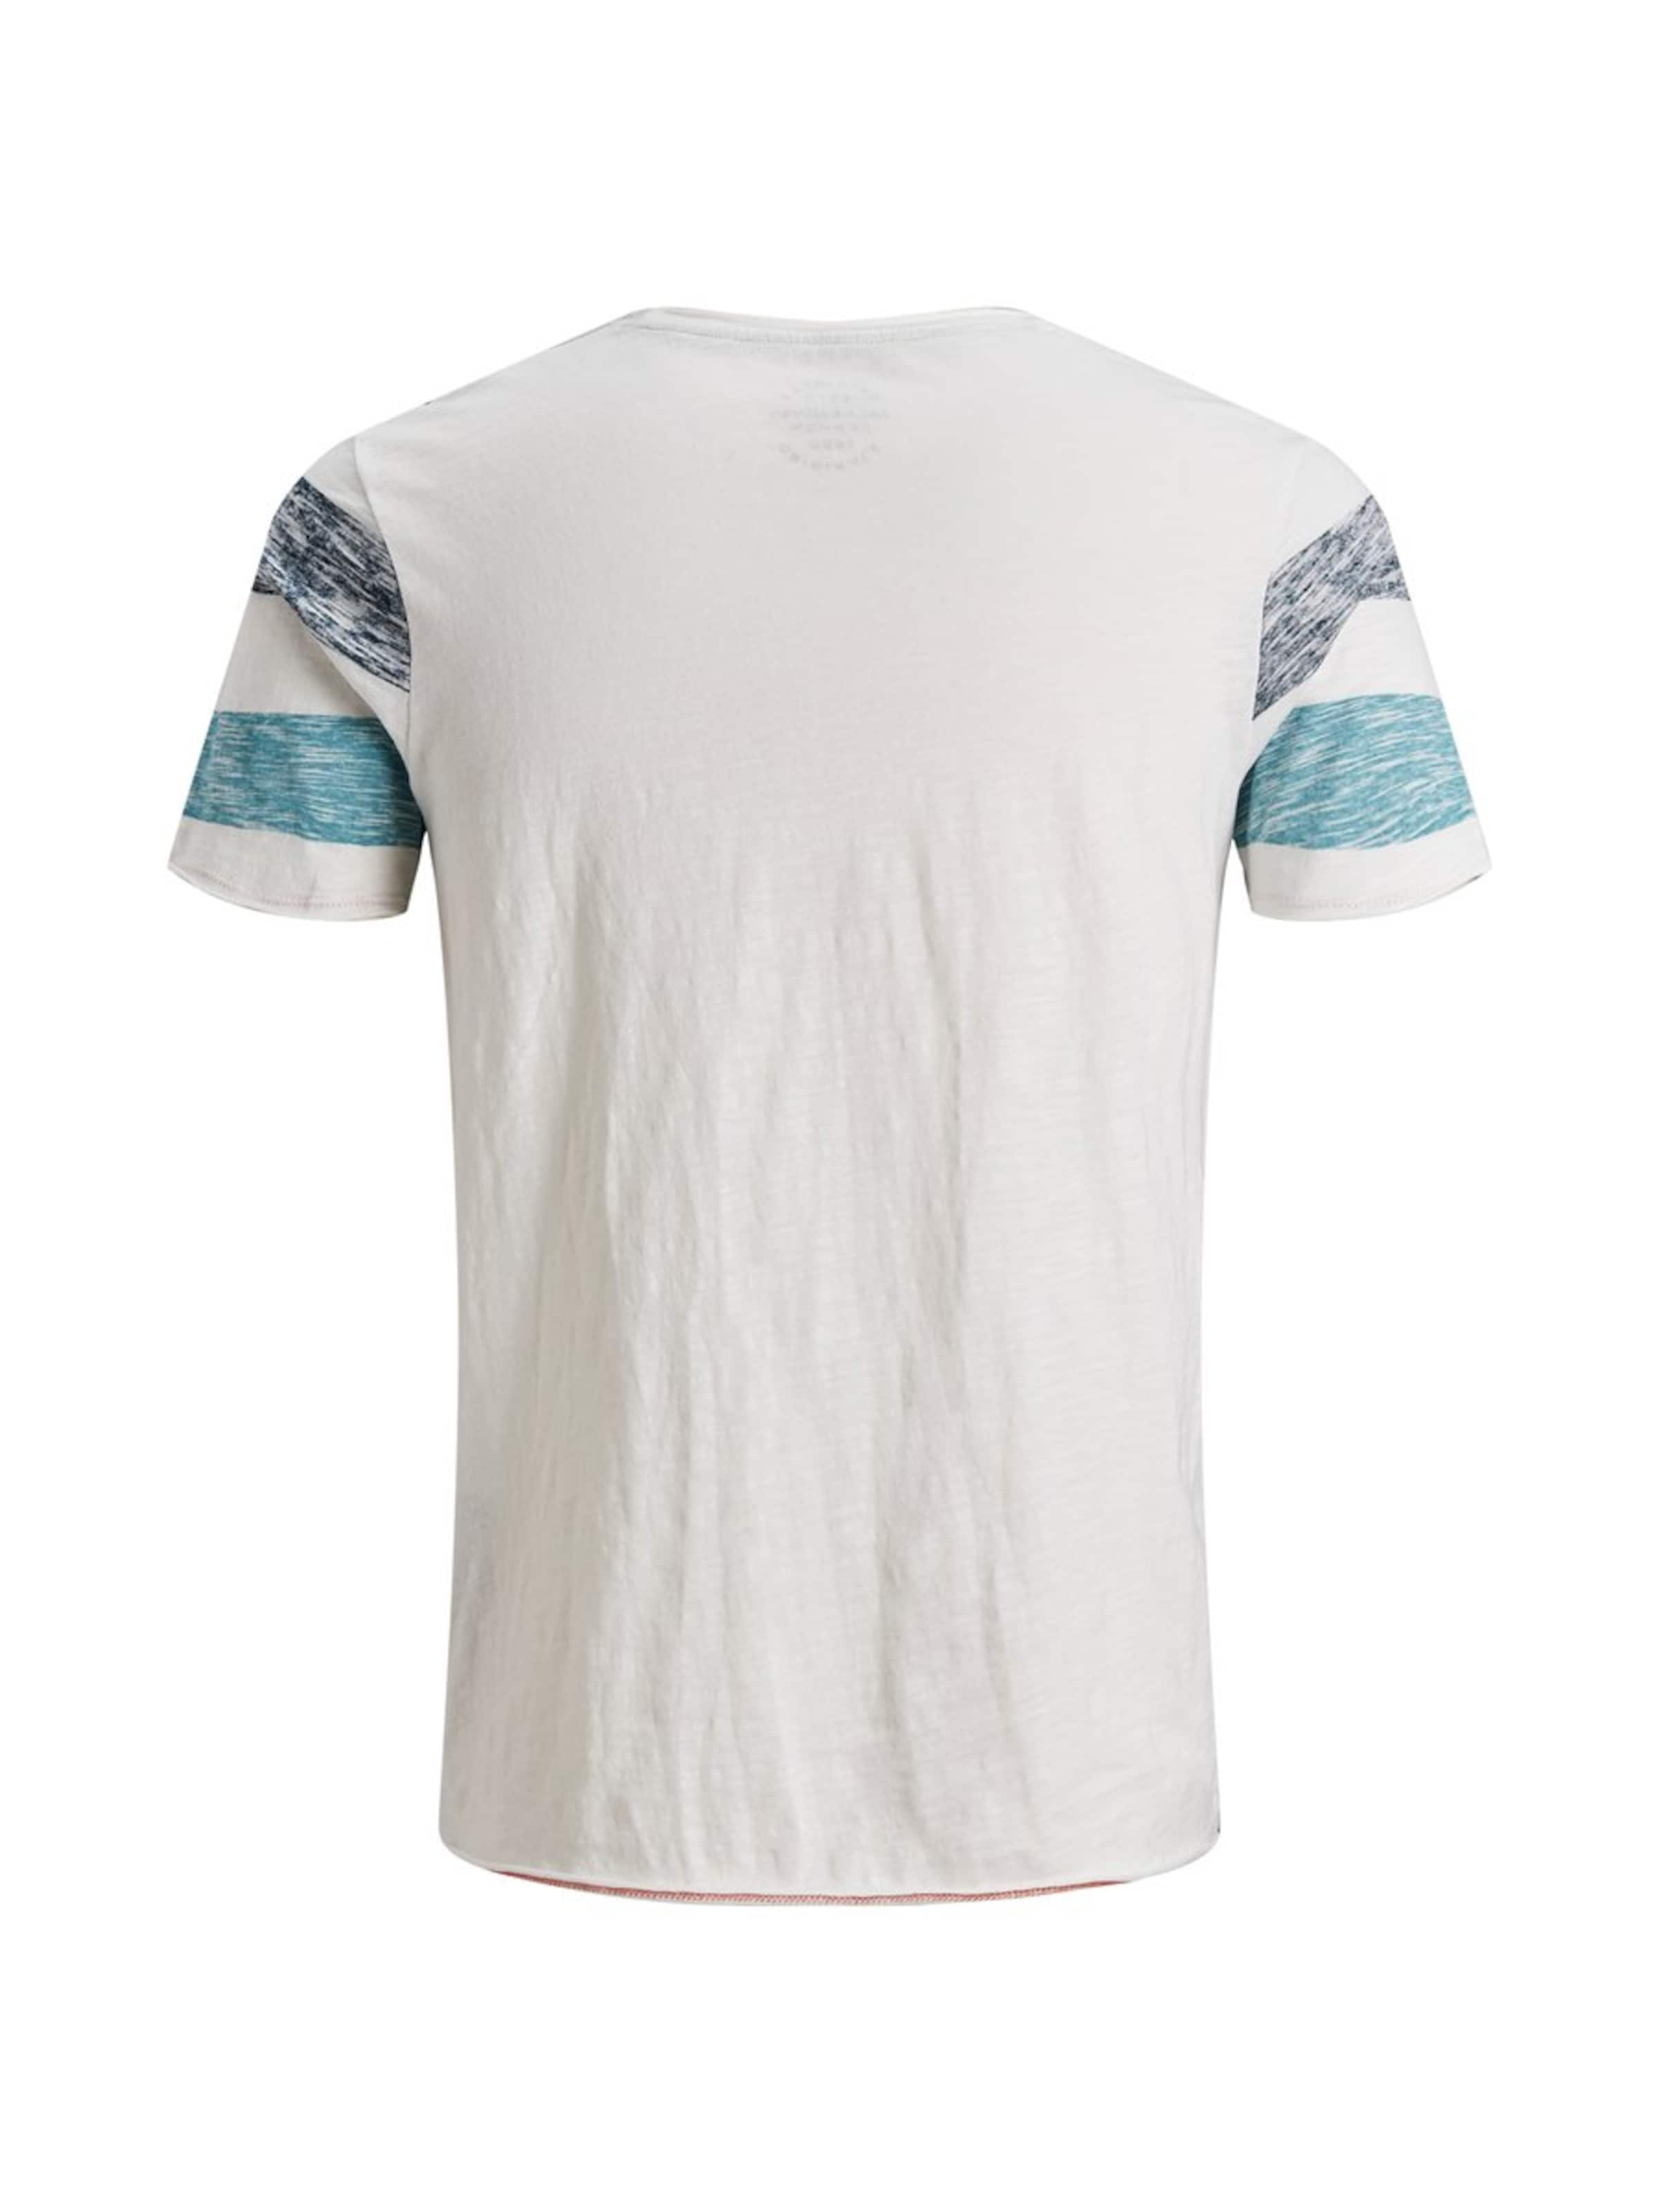 T Jackamp; Weiß Jones NachtblauPastellblau shirt In b6fyvY7g